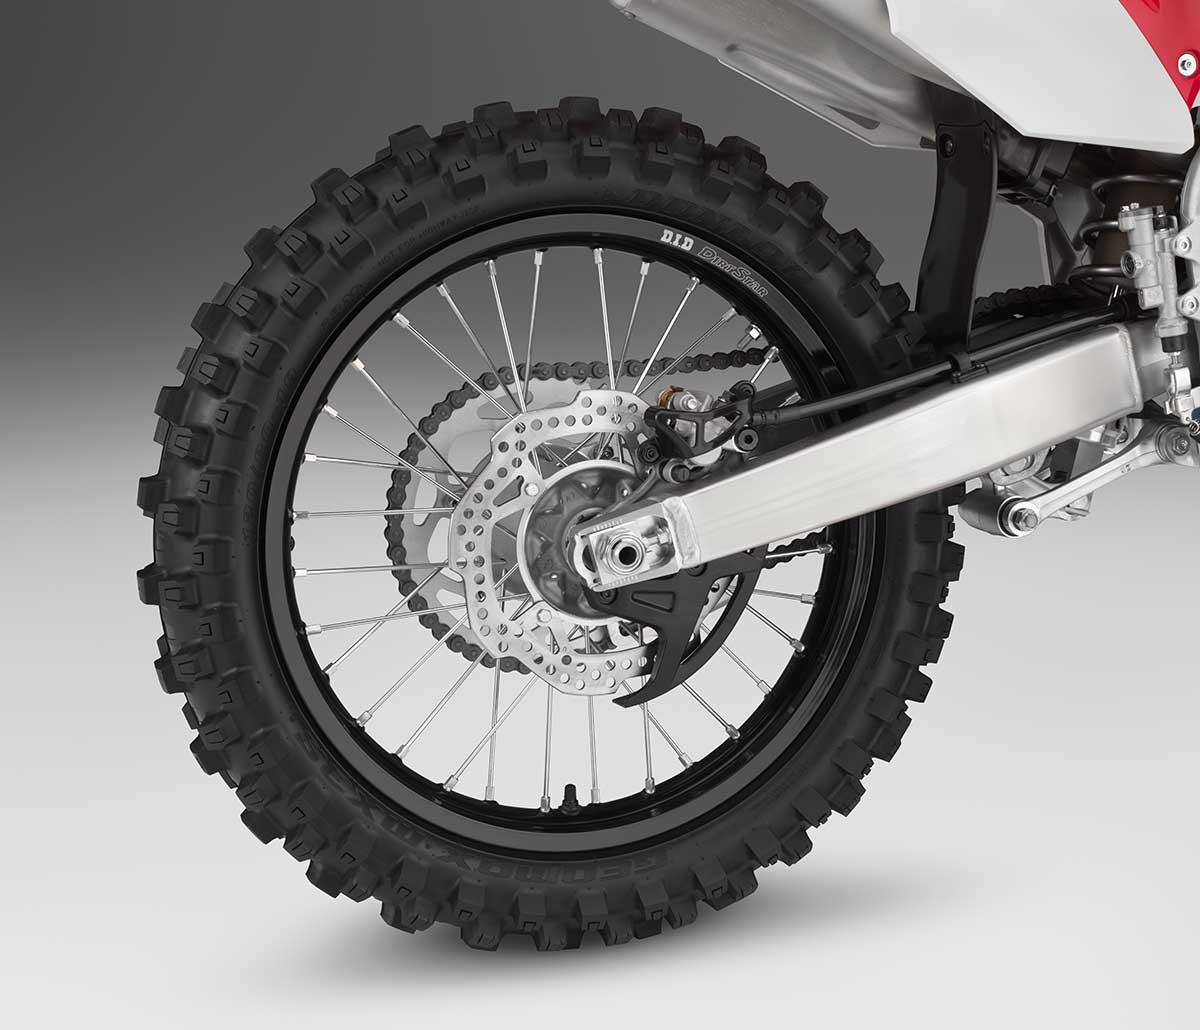 19-Honda-CRF450R_wheel-R.jpg